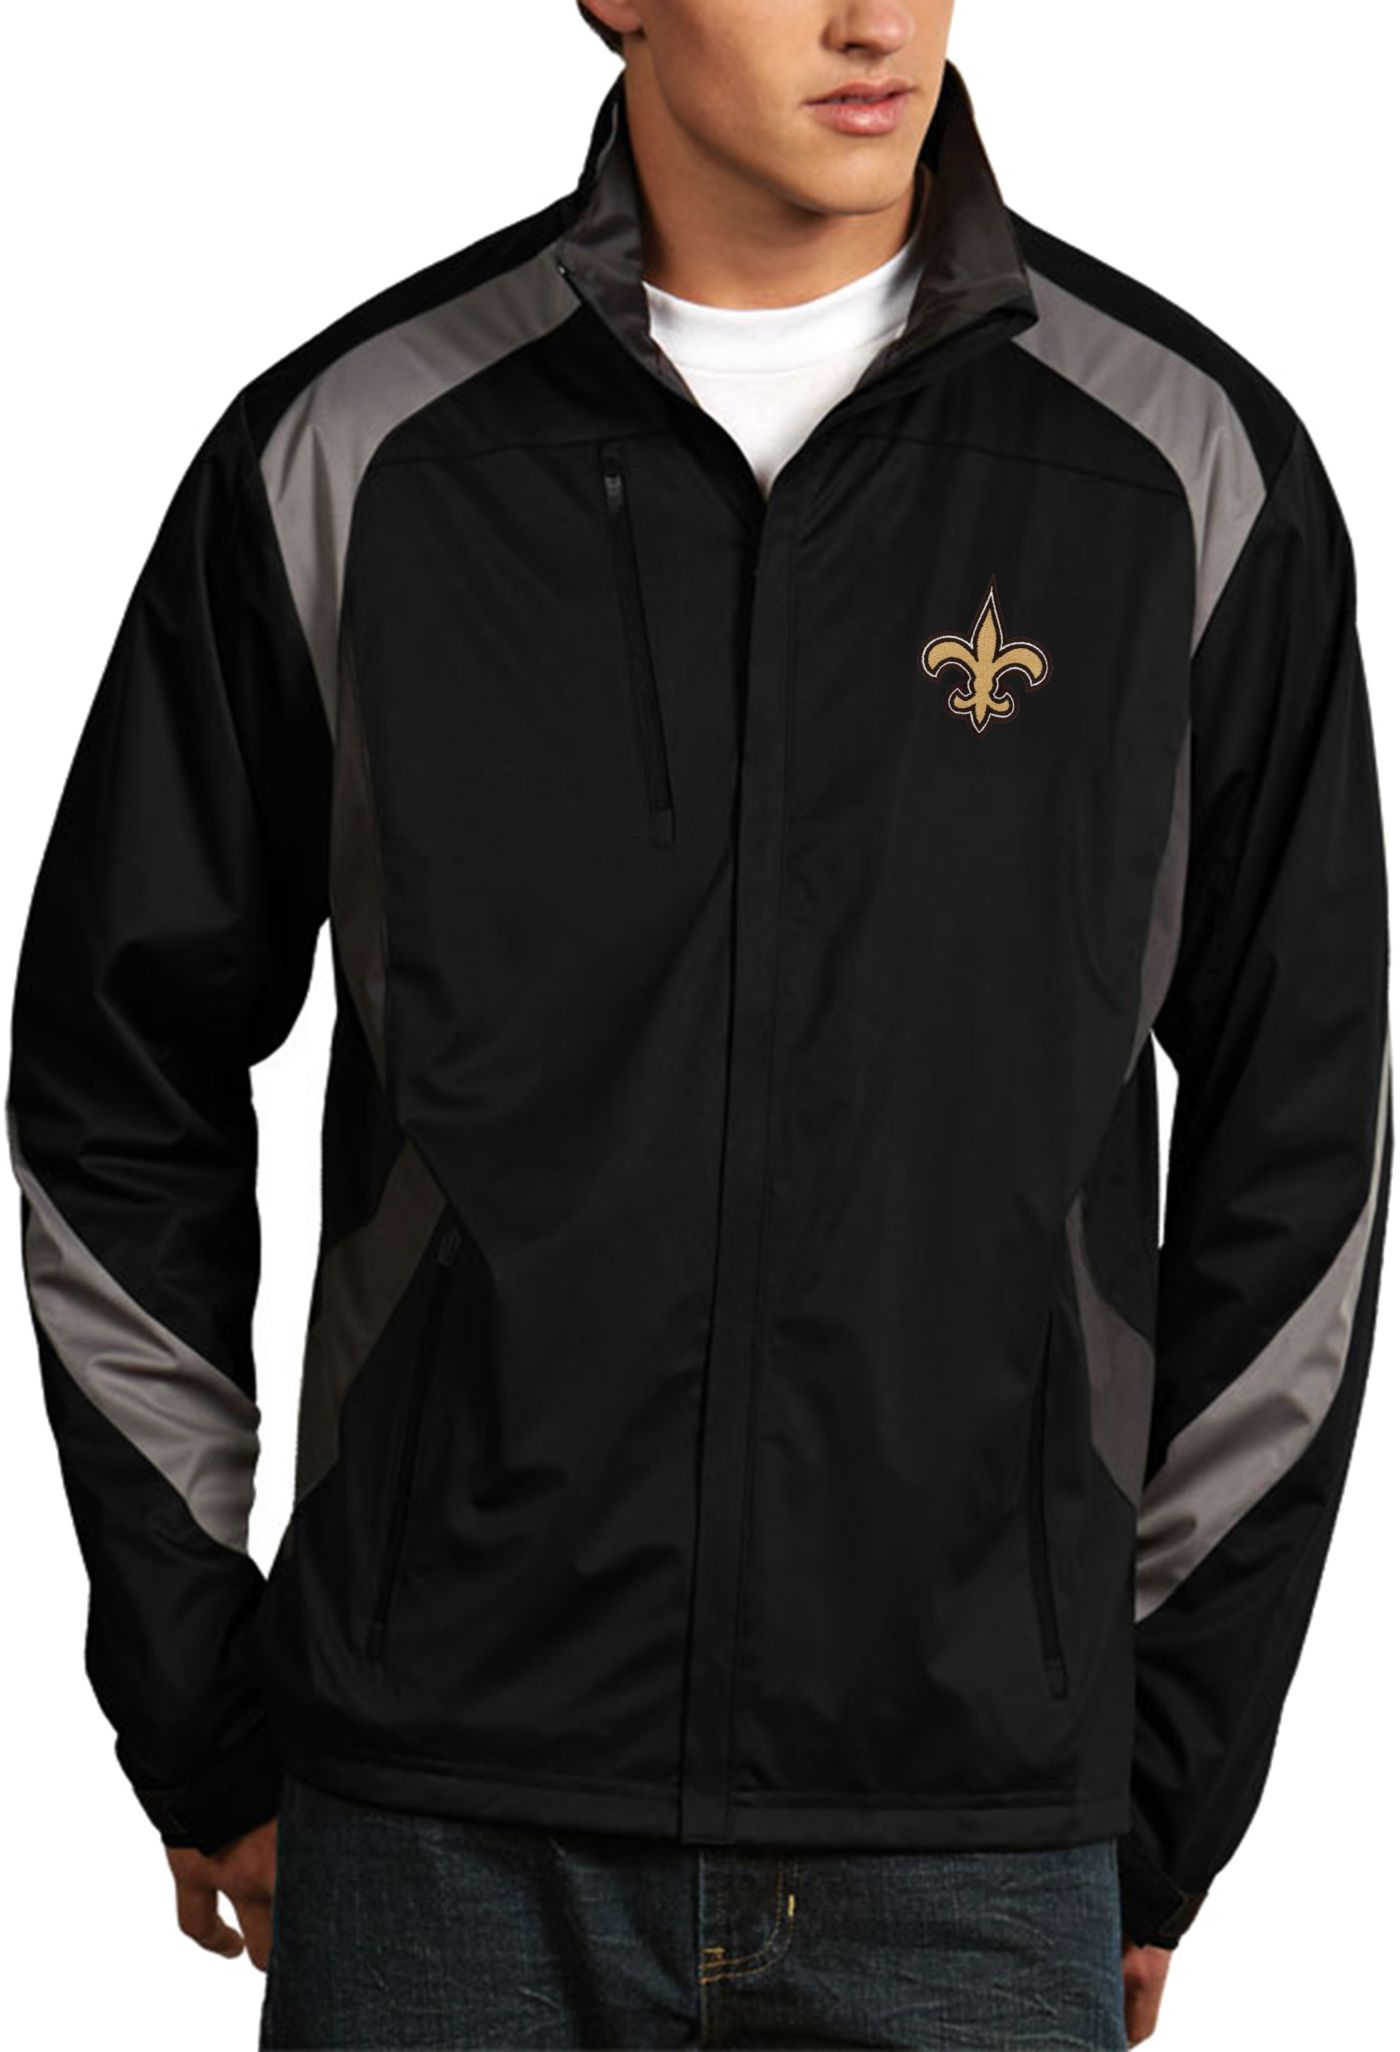 Antigua Men's New Orleans Saints Tempest Black Full-Zip Jacket